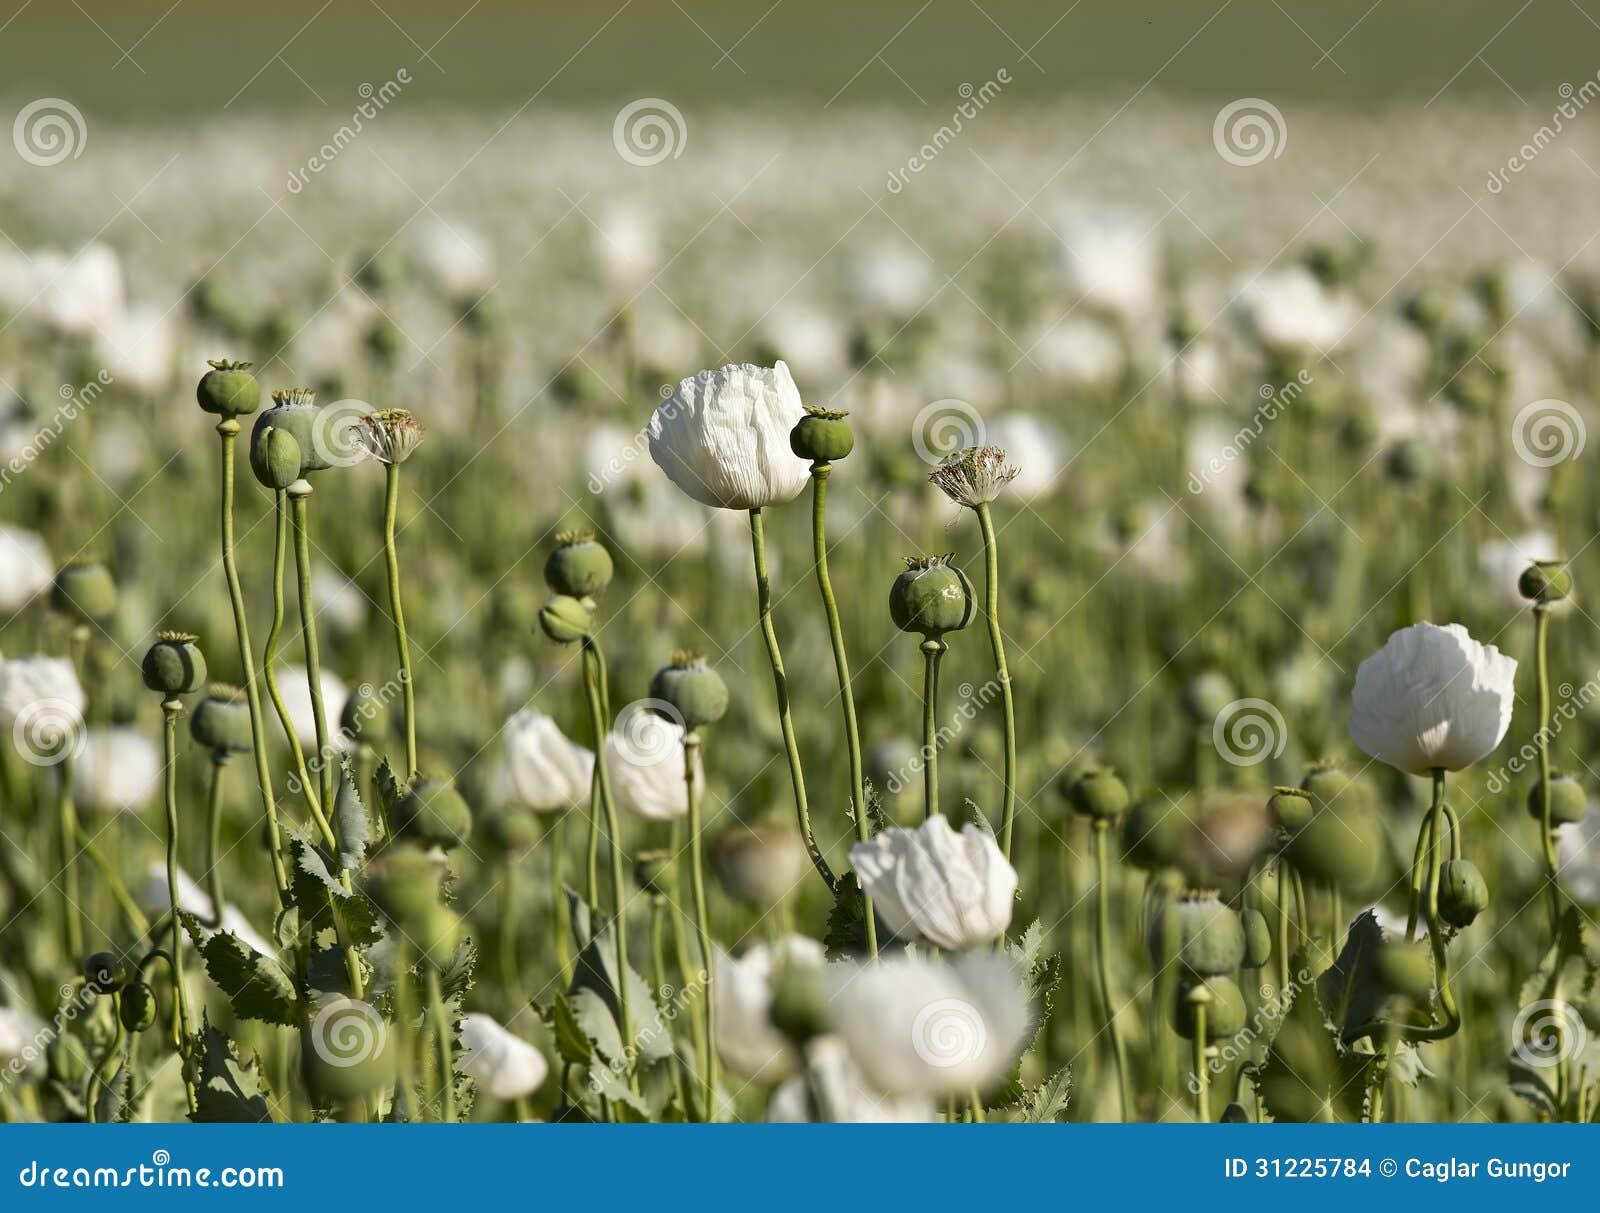 Opium dreams in the romantic